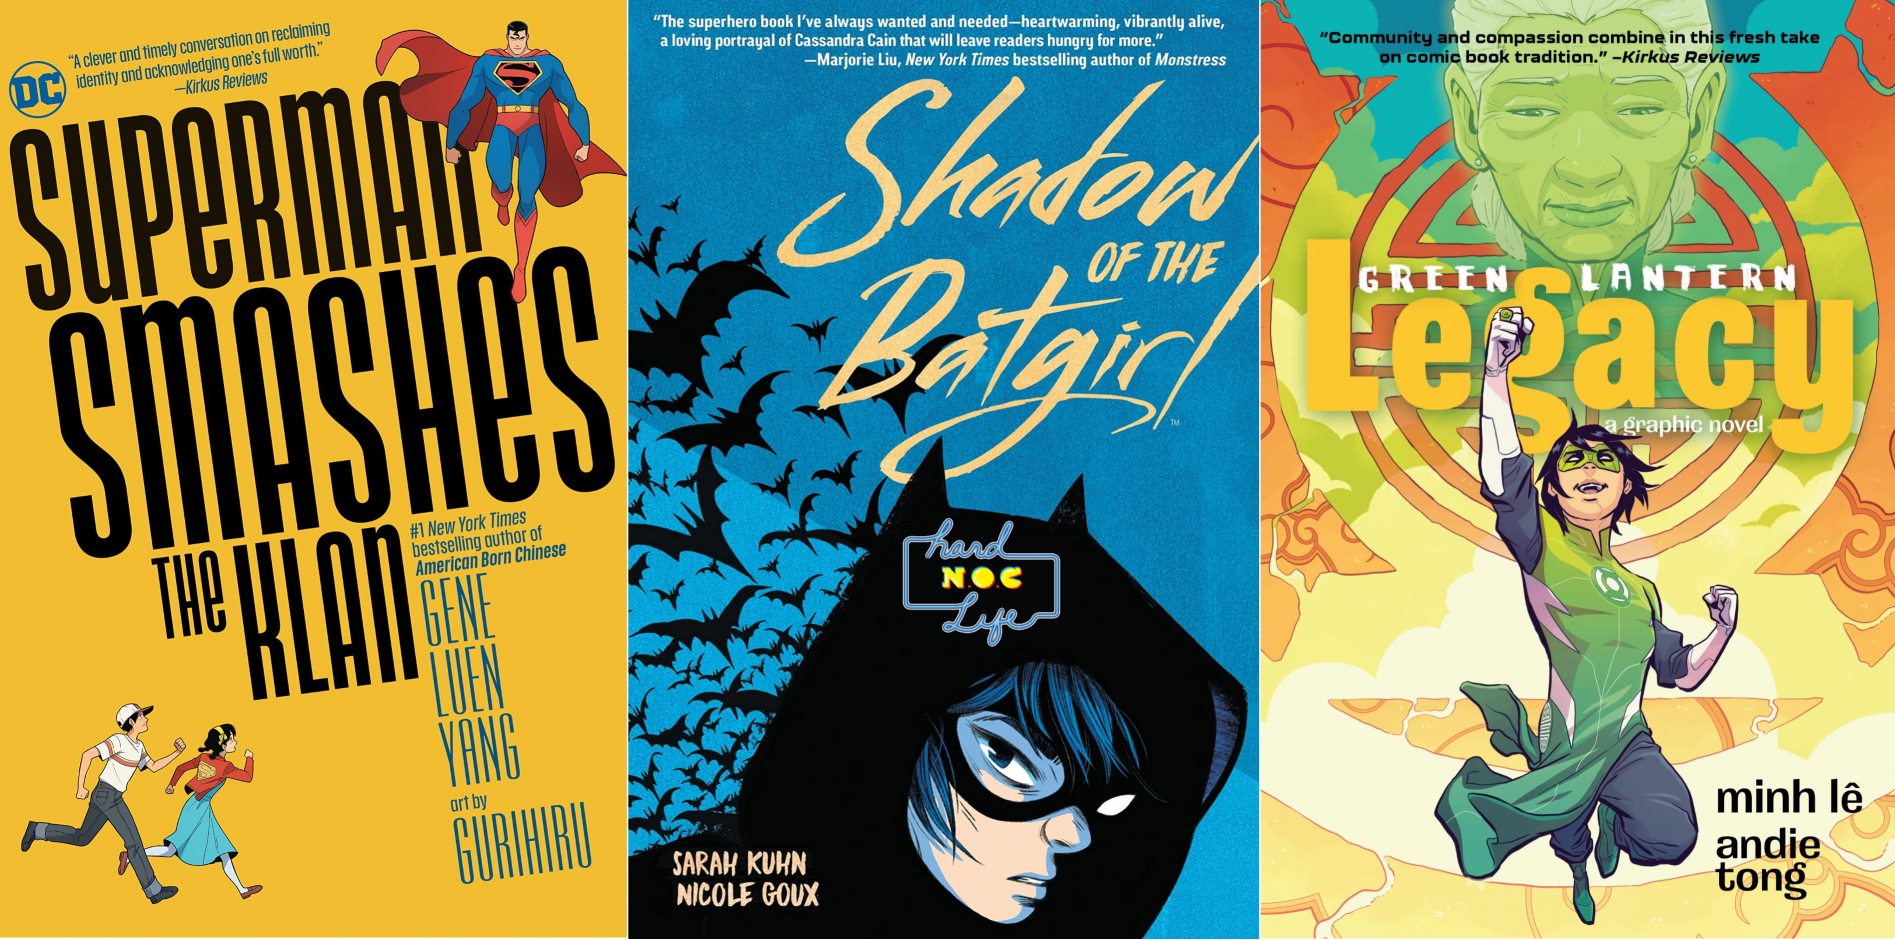 Hard NOC Life: DC Celebrates APA Heritage Month with Gene Yang, Sarah Kuhn, and Minh Lê